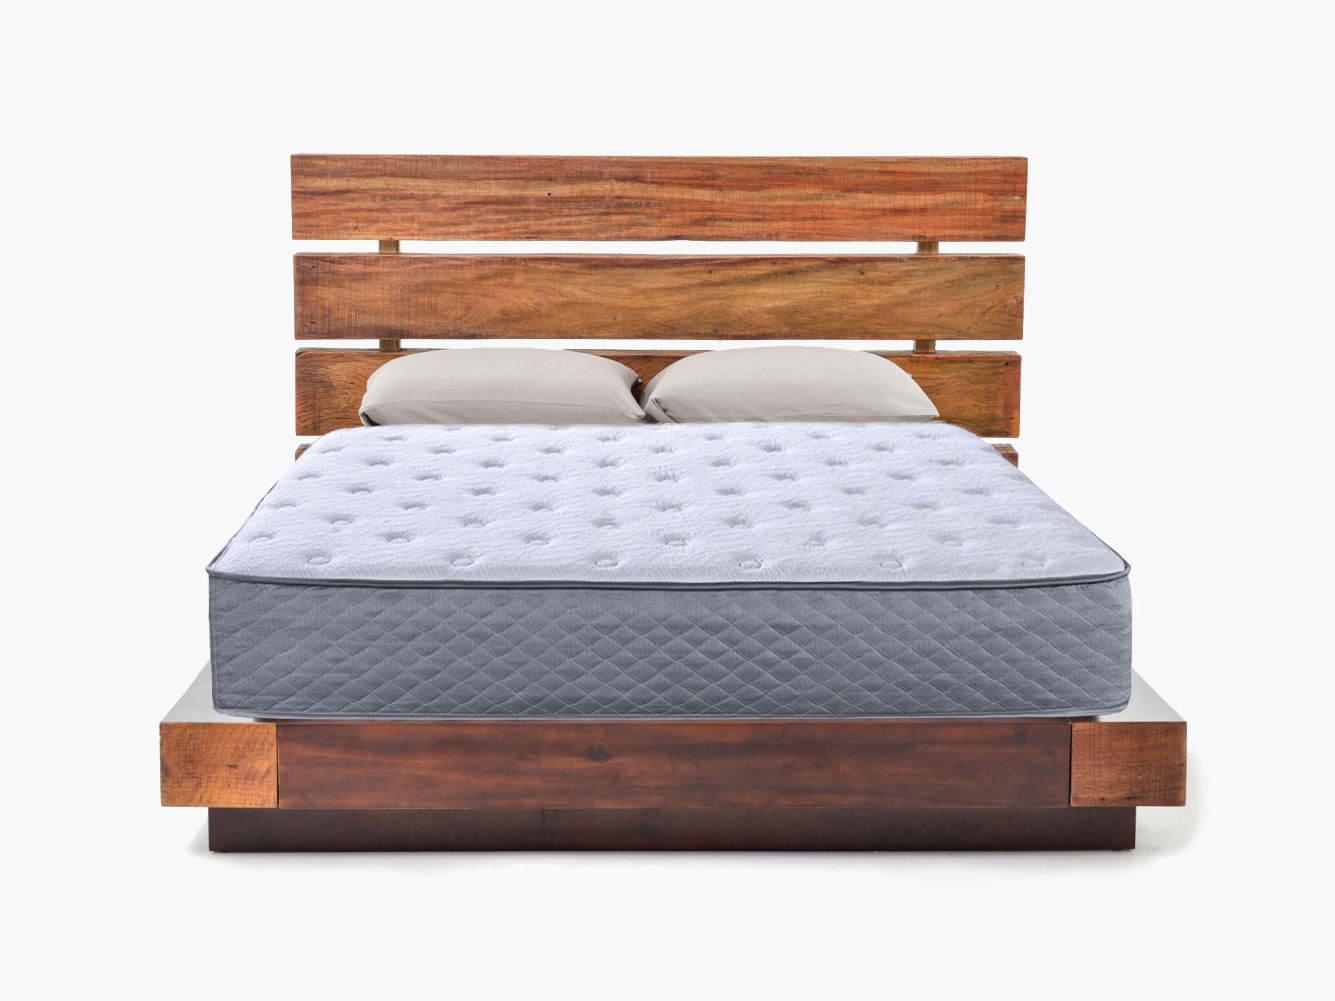 fin14-mattress-looks-solidon-this-wood-frame.jpg